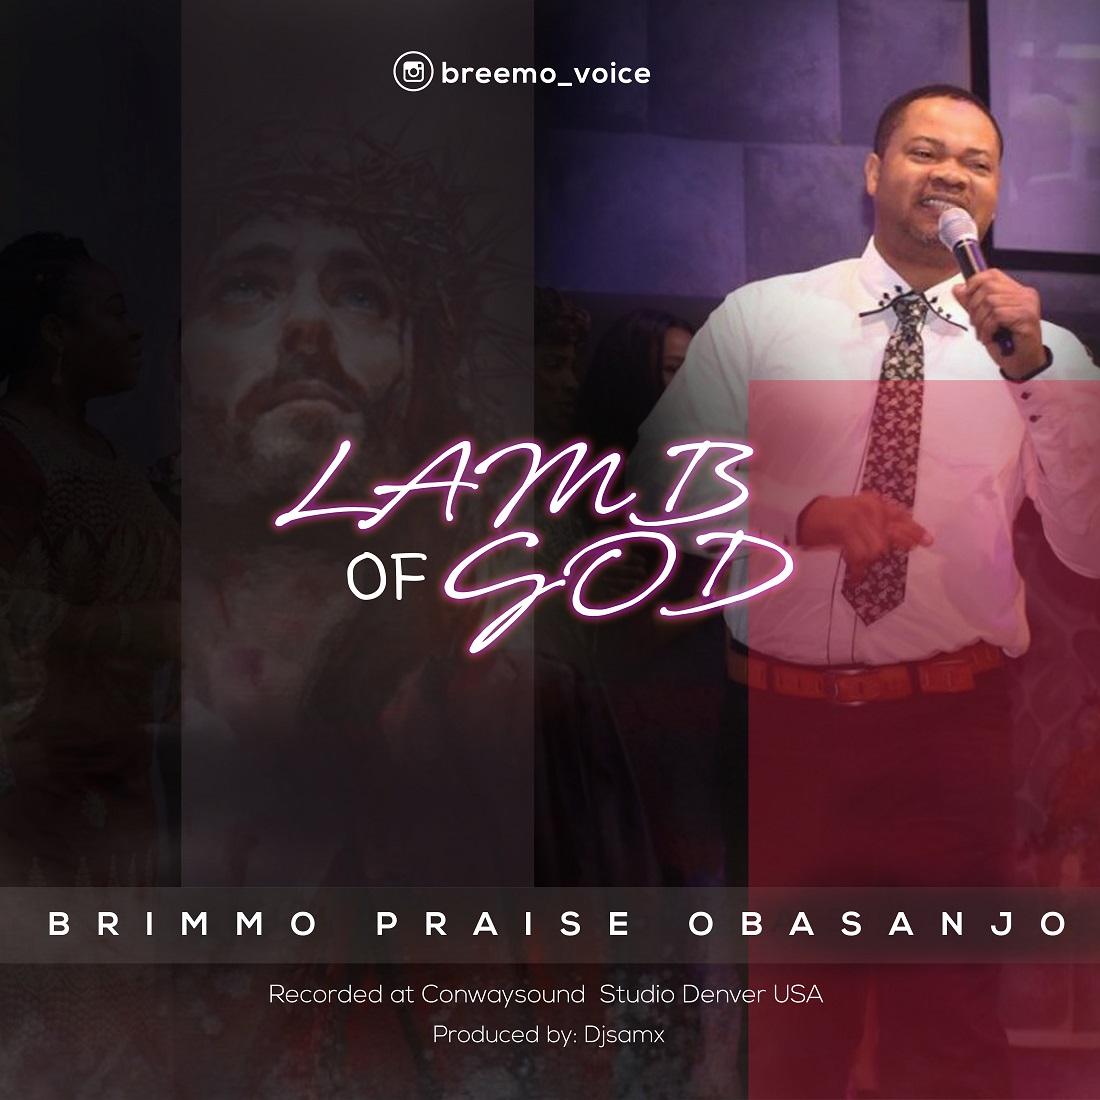 Gospel Music: Obasanjo Brimmo Praise – Lamb of God